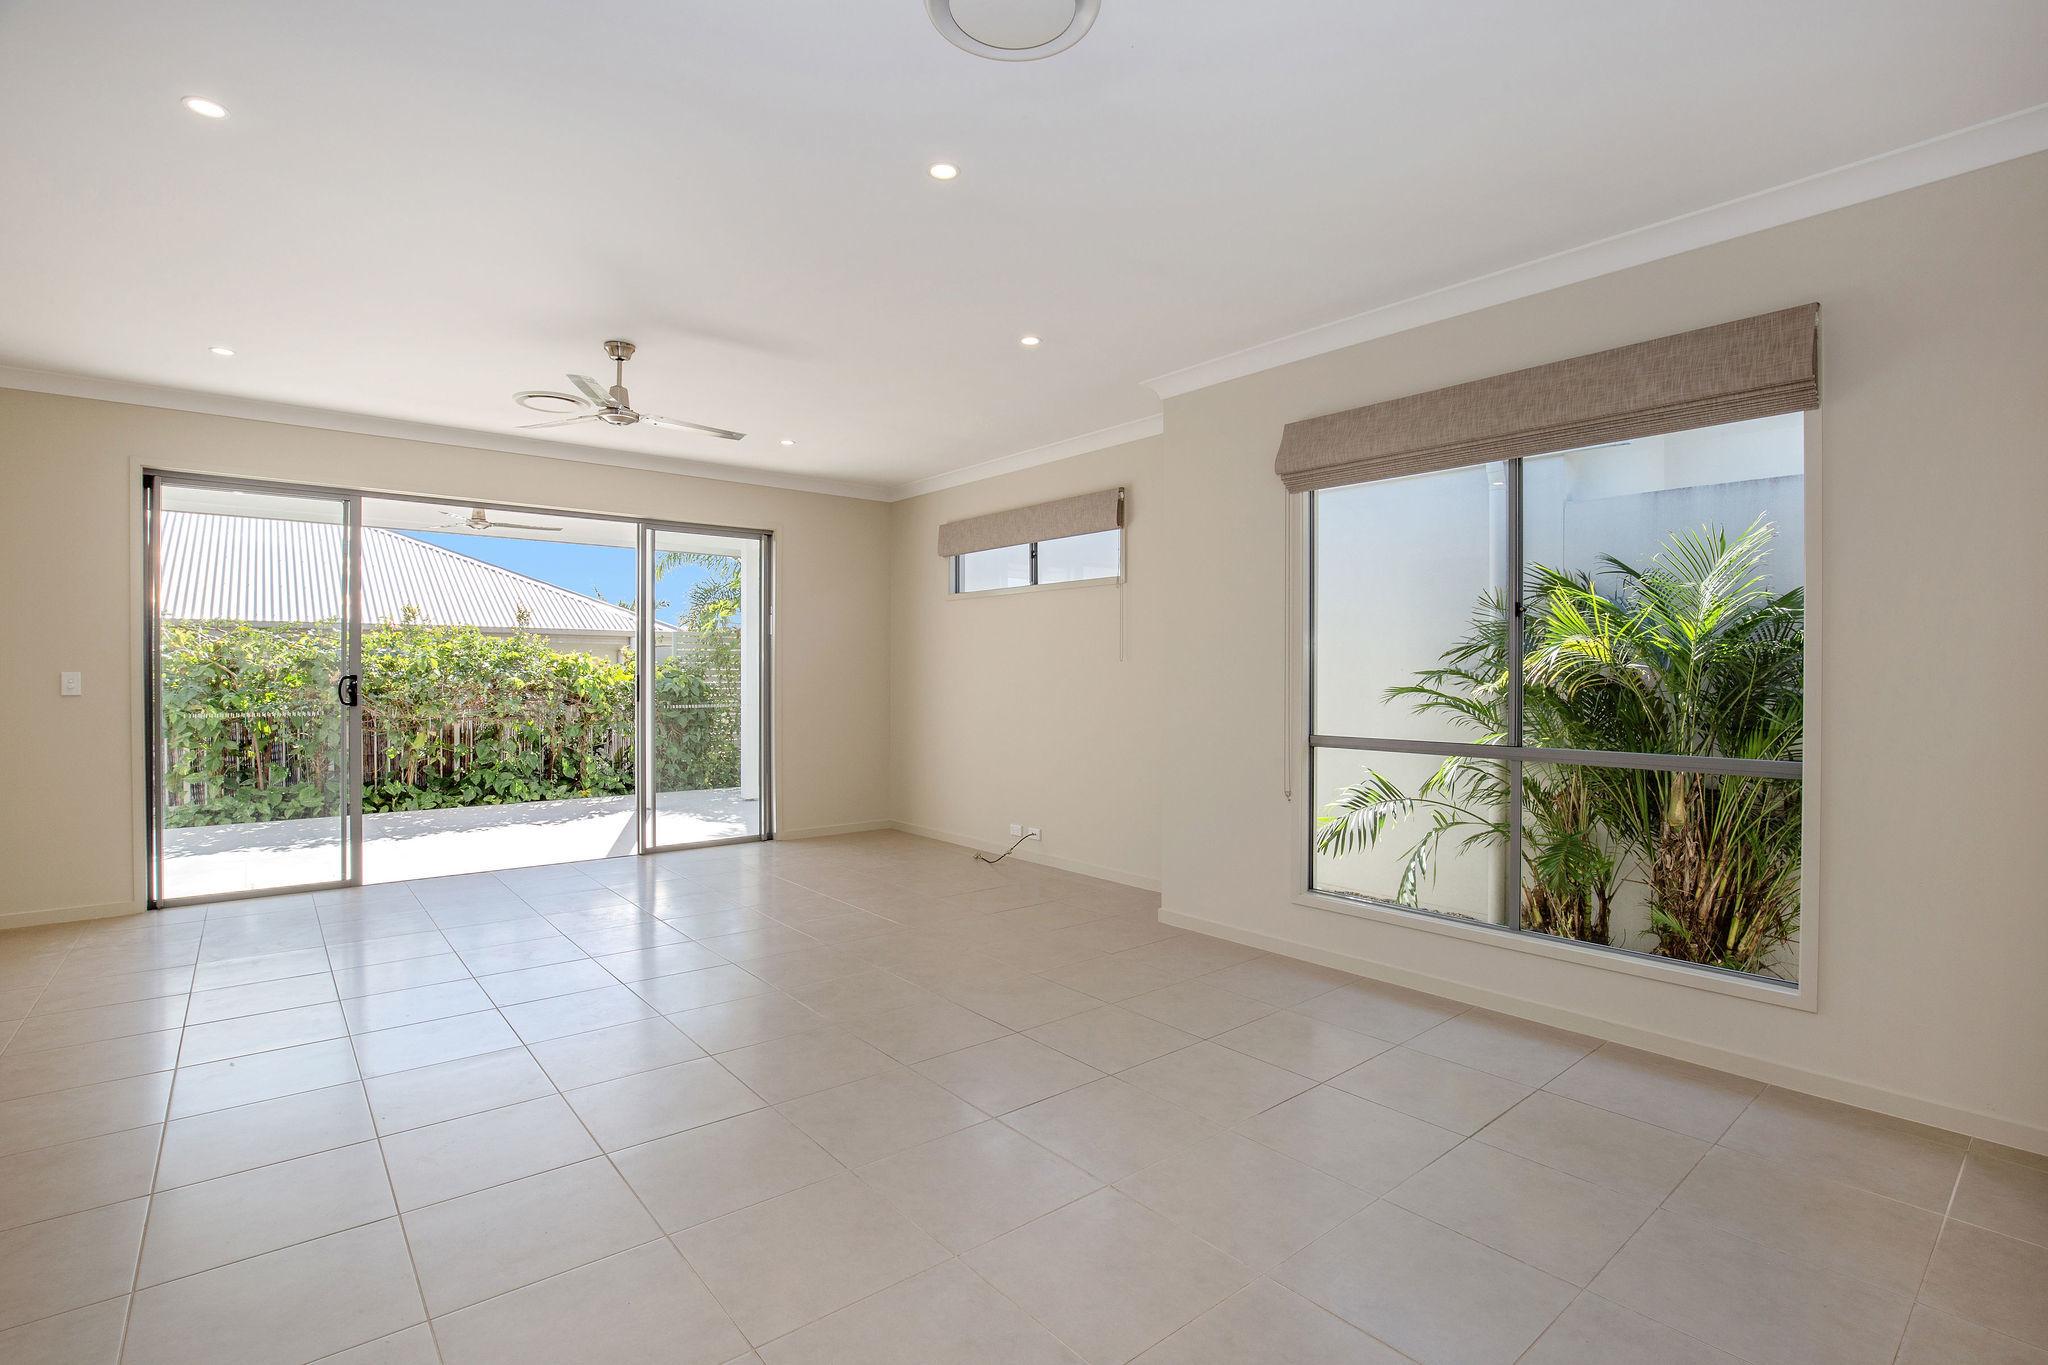 Real Estate Australia